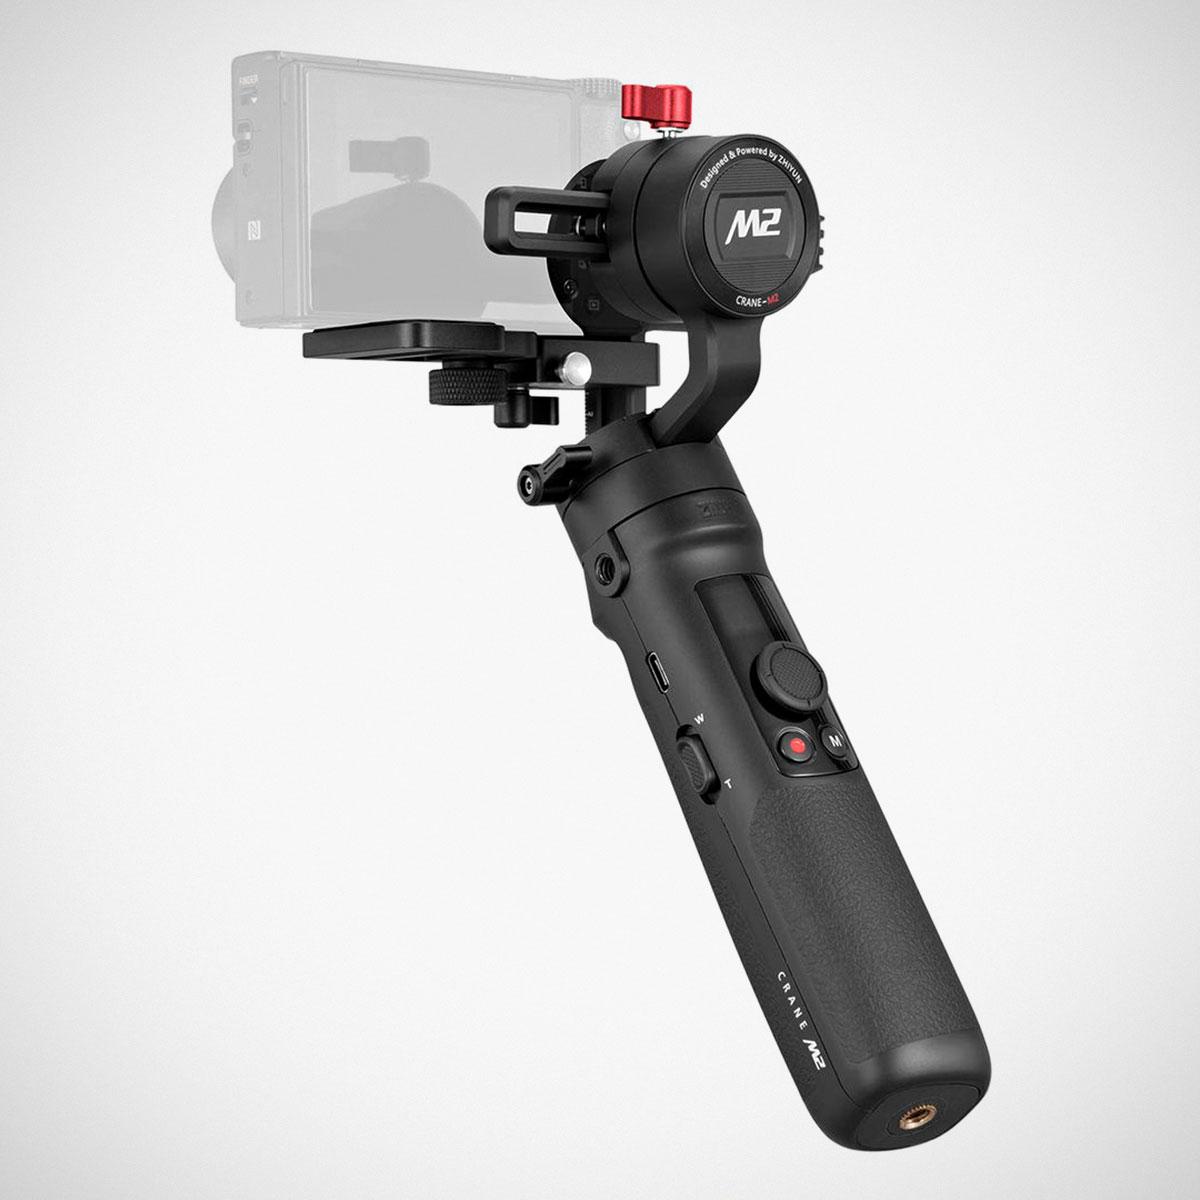 Zhiyun CRANE-M2 Camera Stabilizer